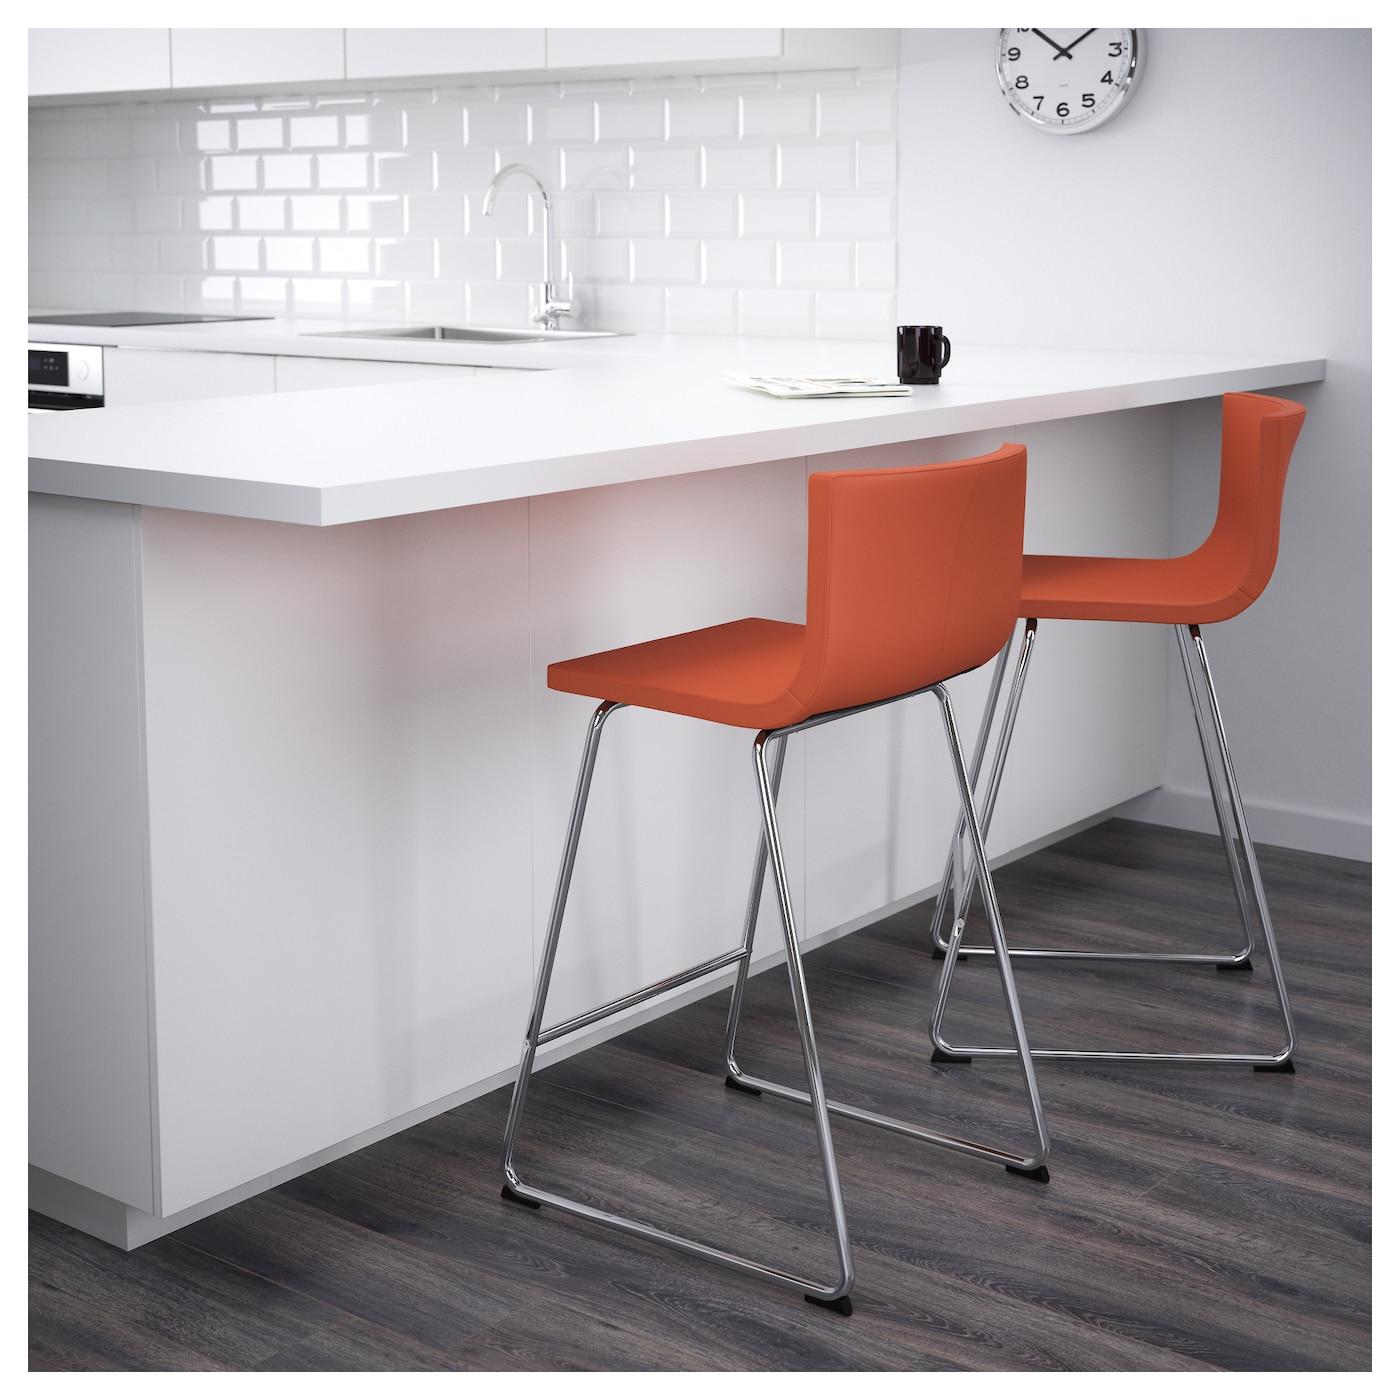 Bernhard Bar Stool With Backrest Chrome Plated Mjuk Orange